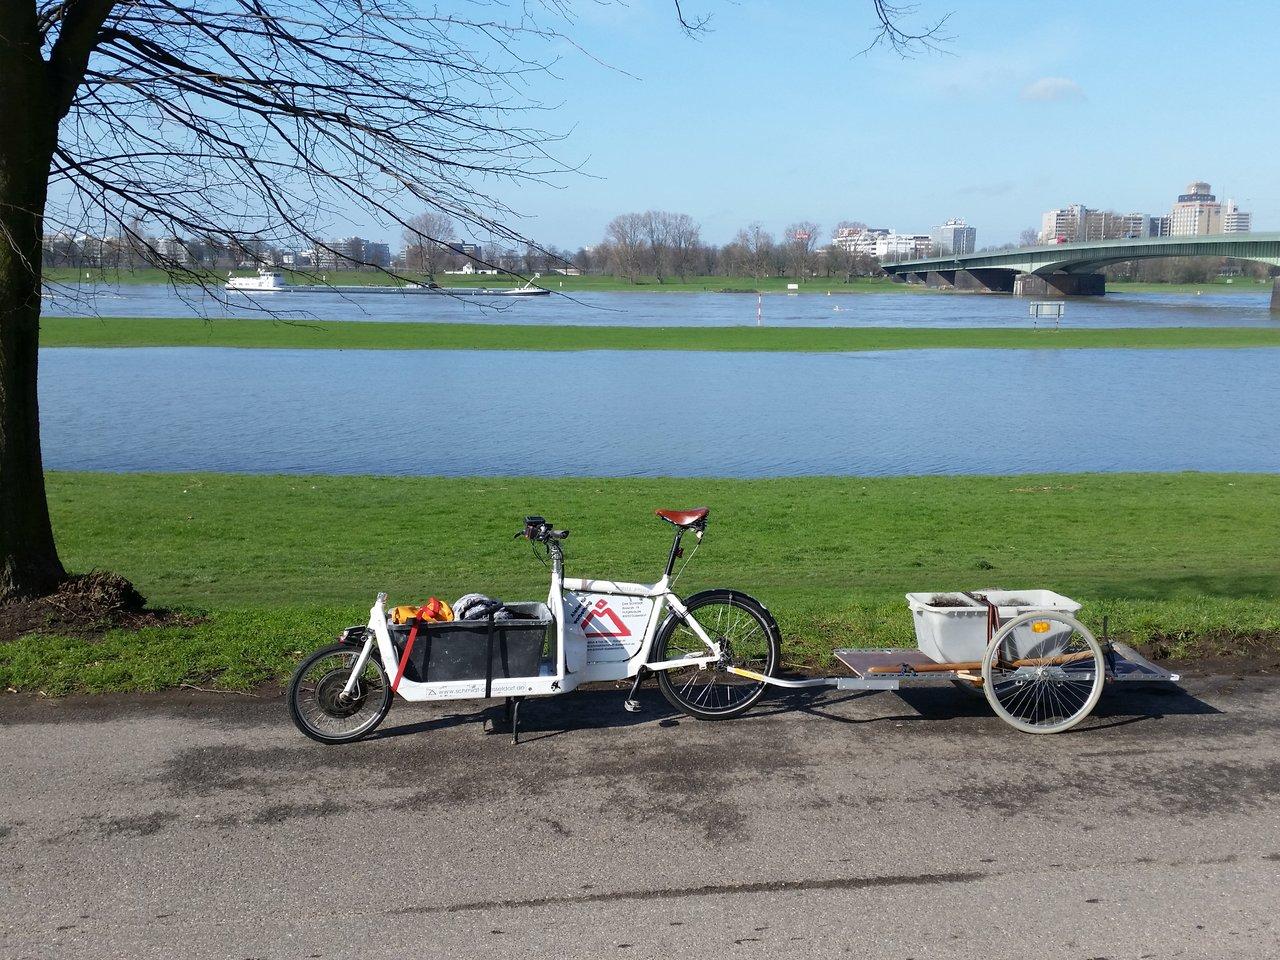 Fahrradanhänger_Rollstuhlreifen_2020_23.jpg